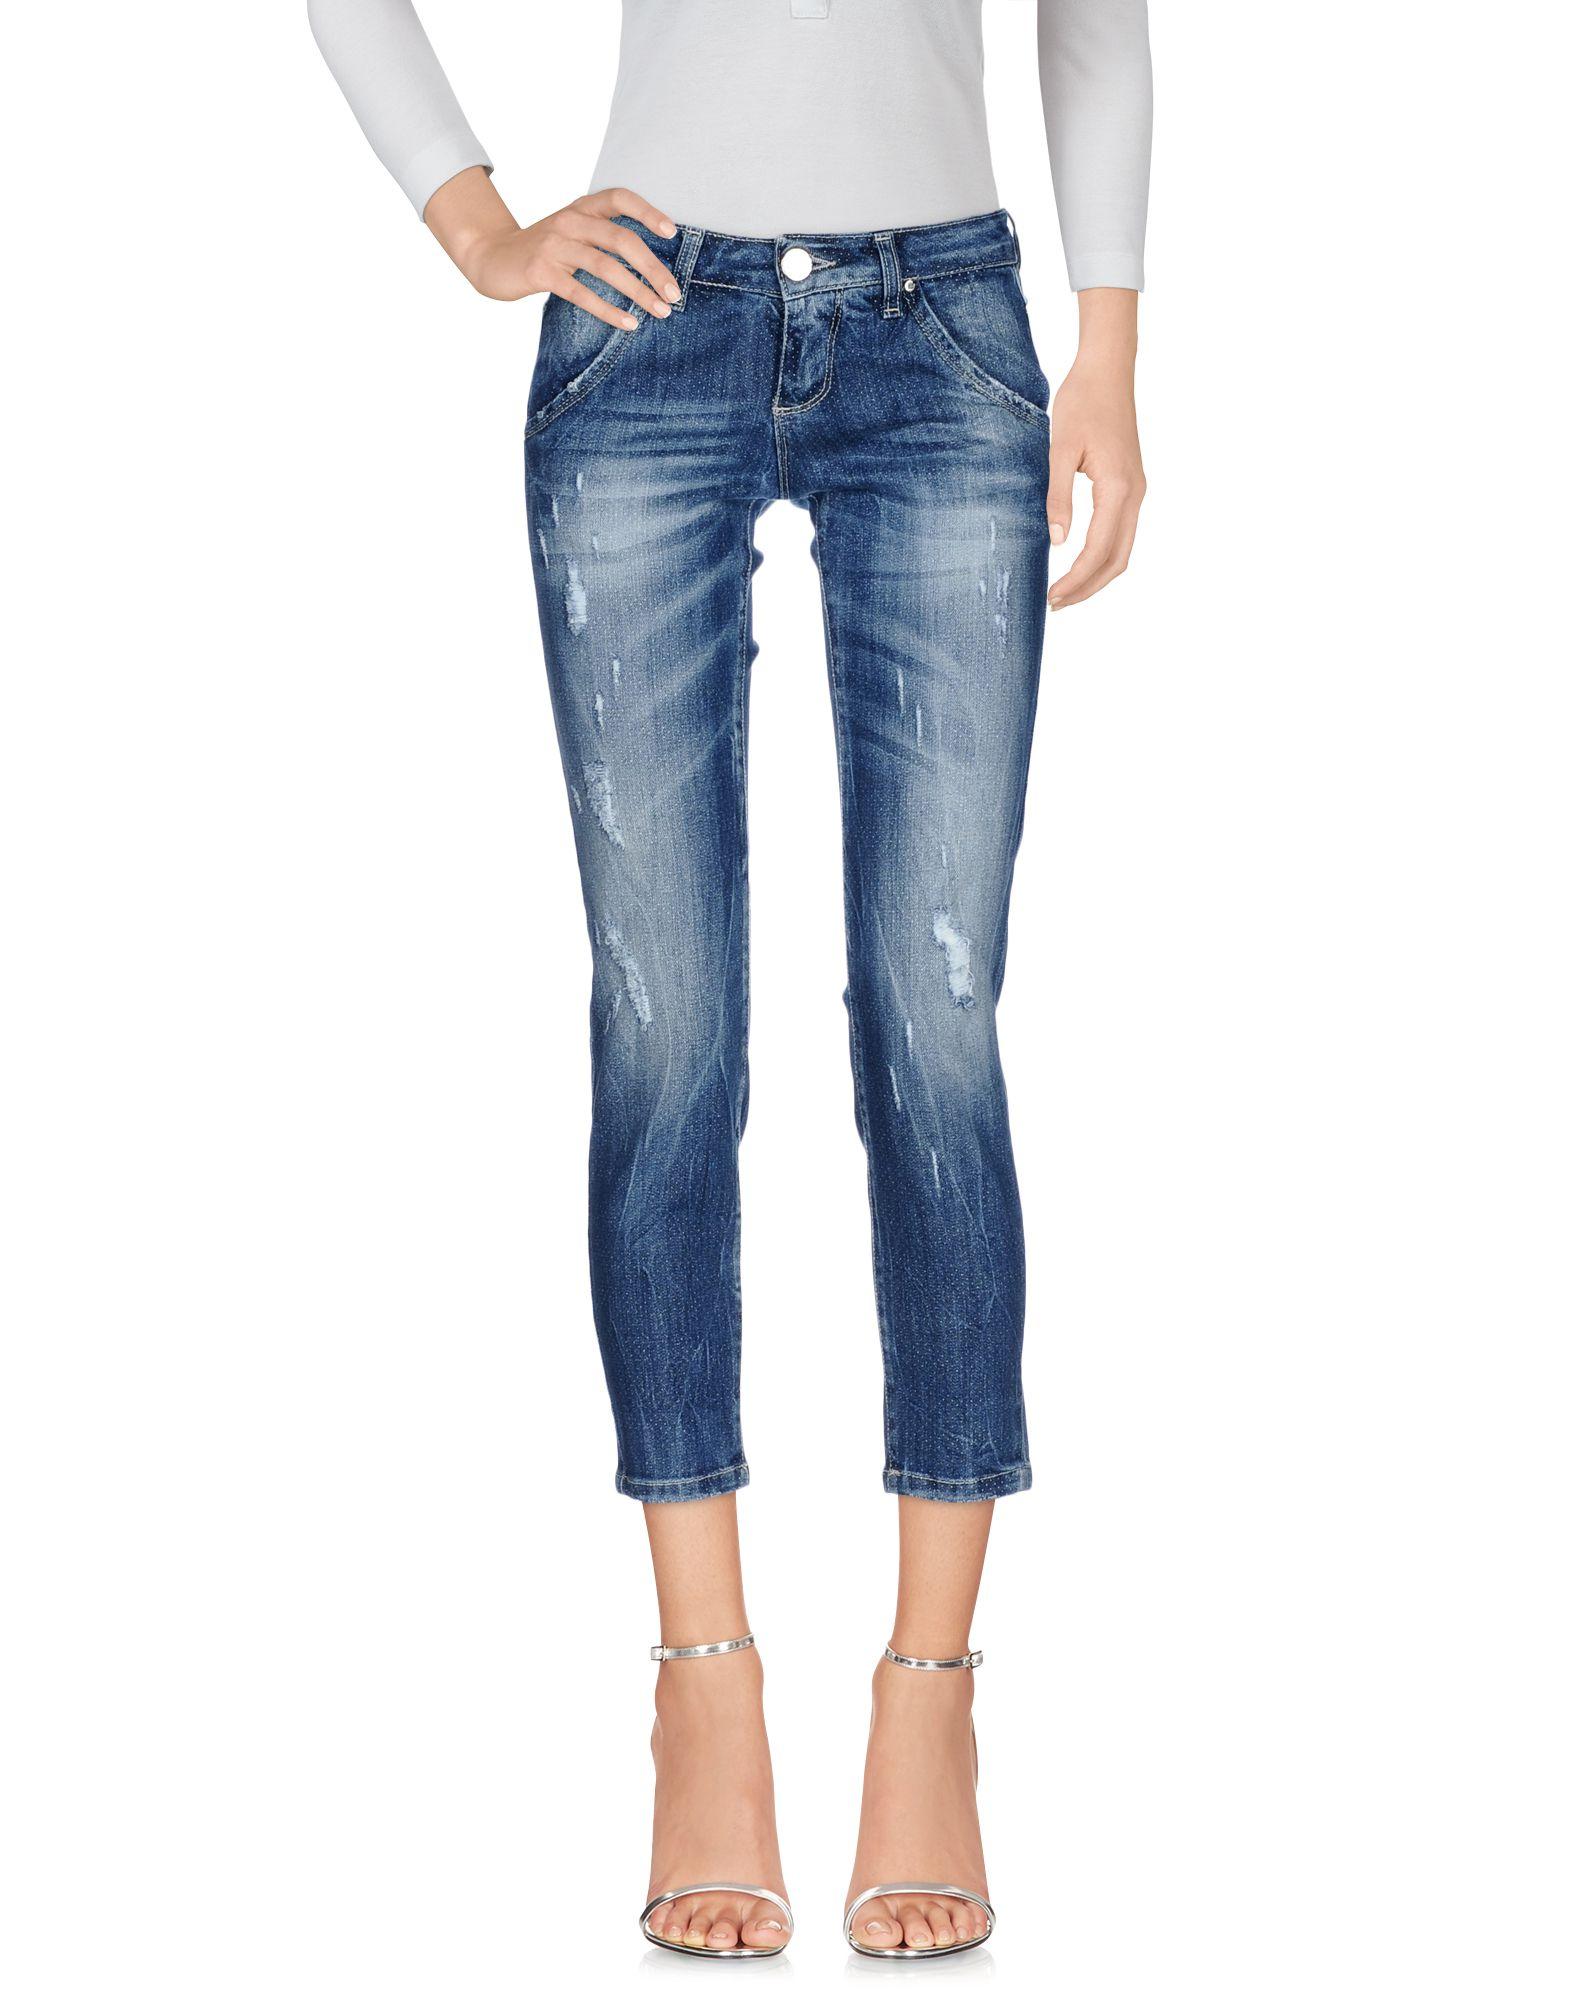 FLY GIRL Jeans